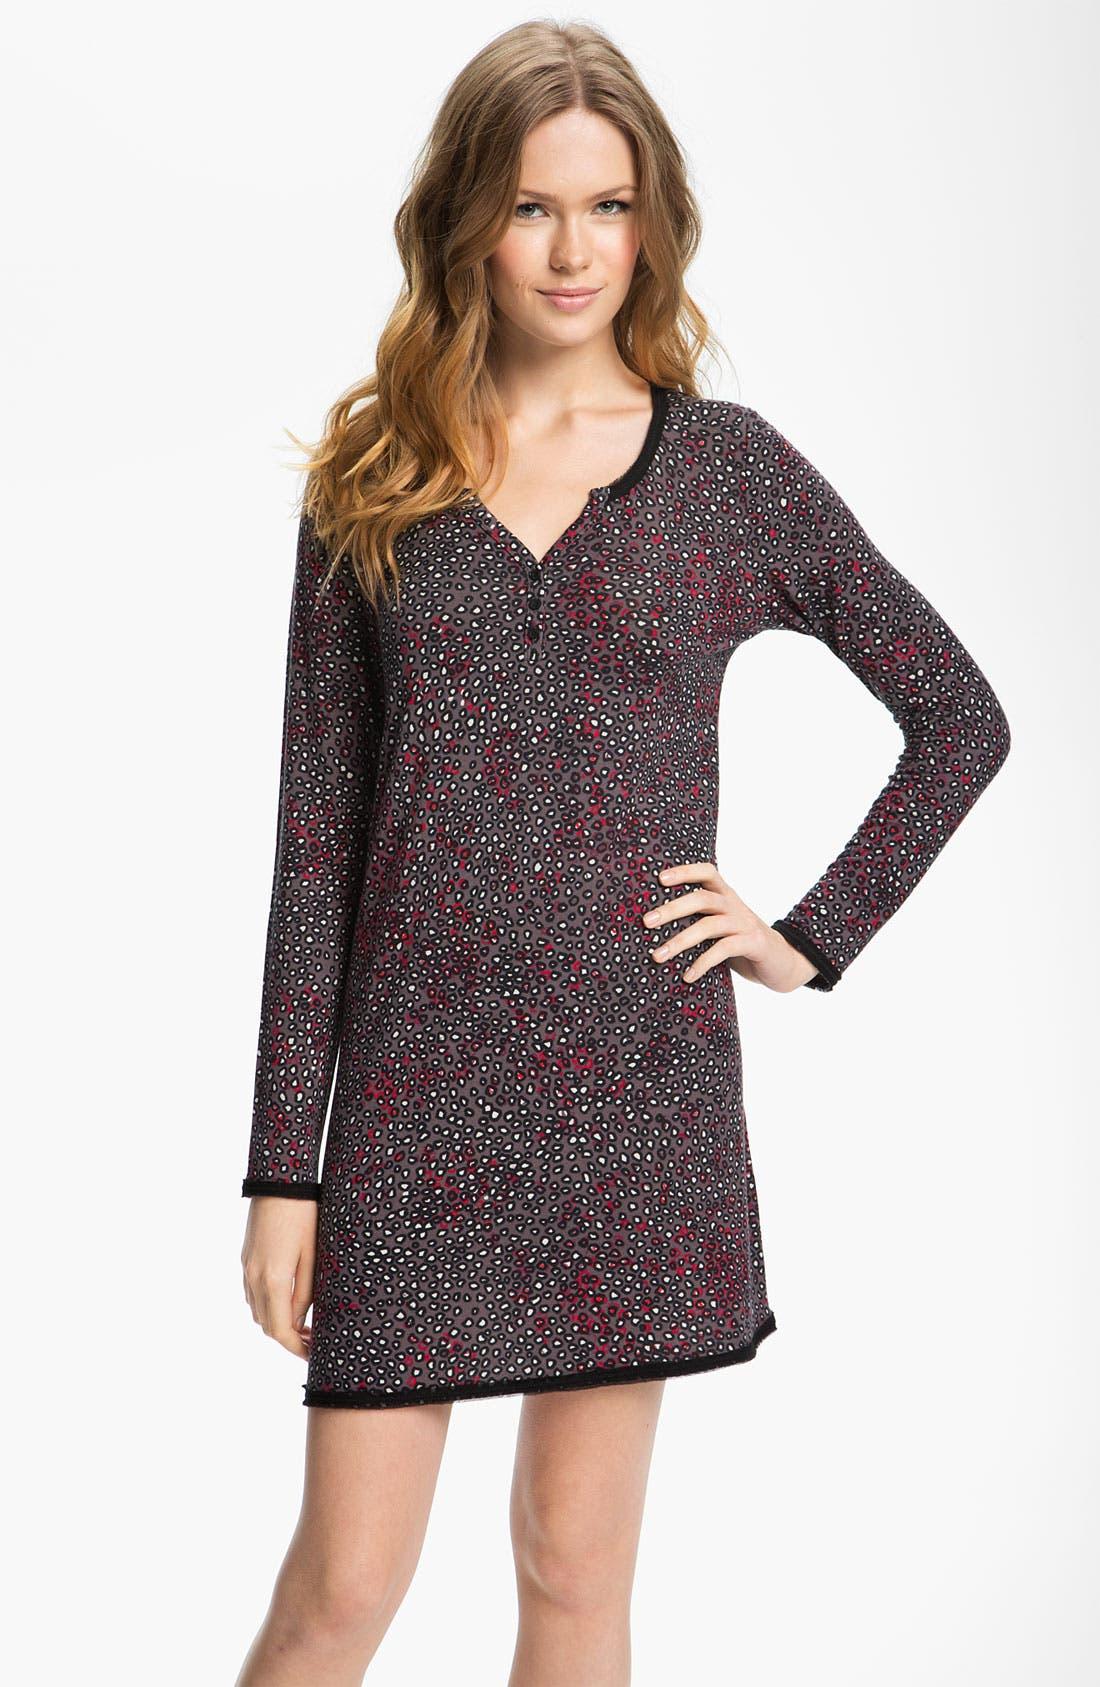 Main Image - DKNY 'Sheer Bliss' Sleep Shirt